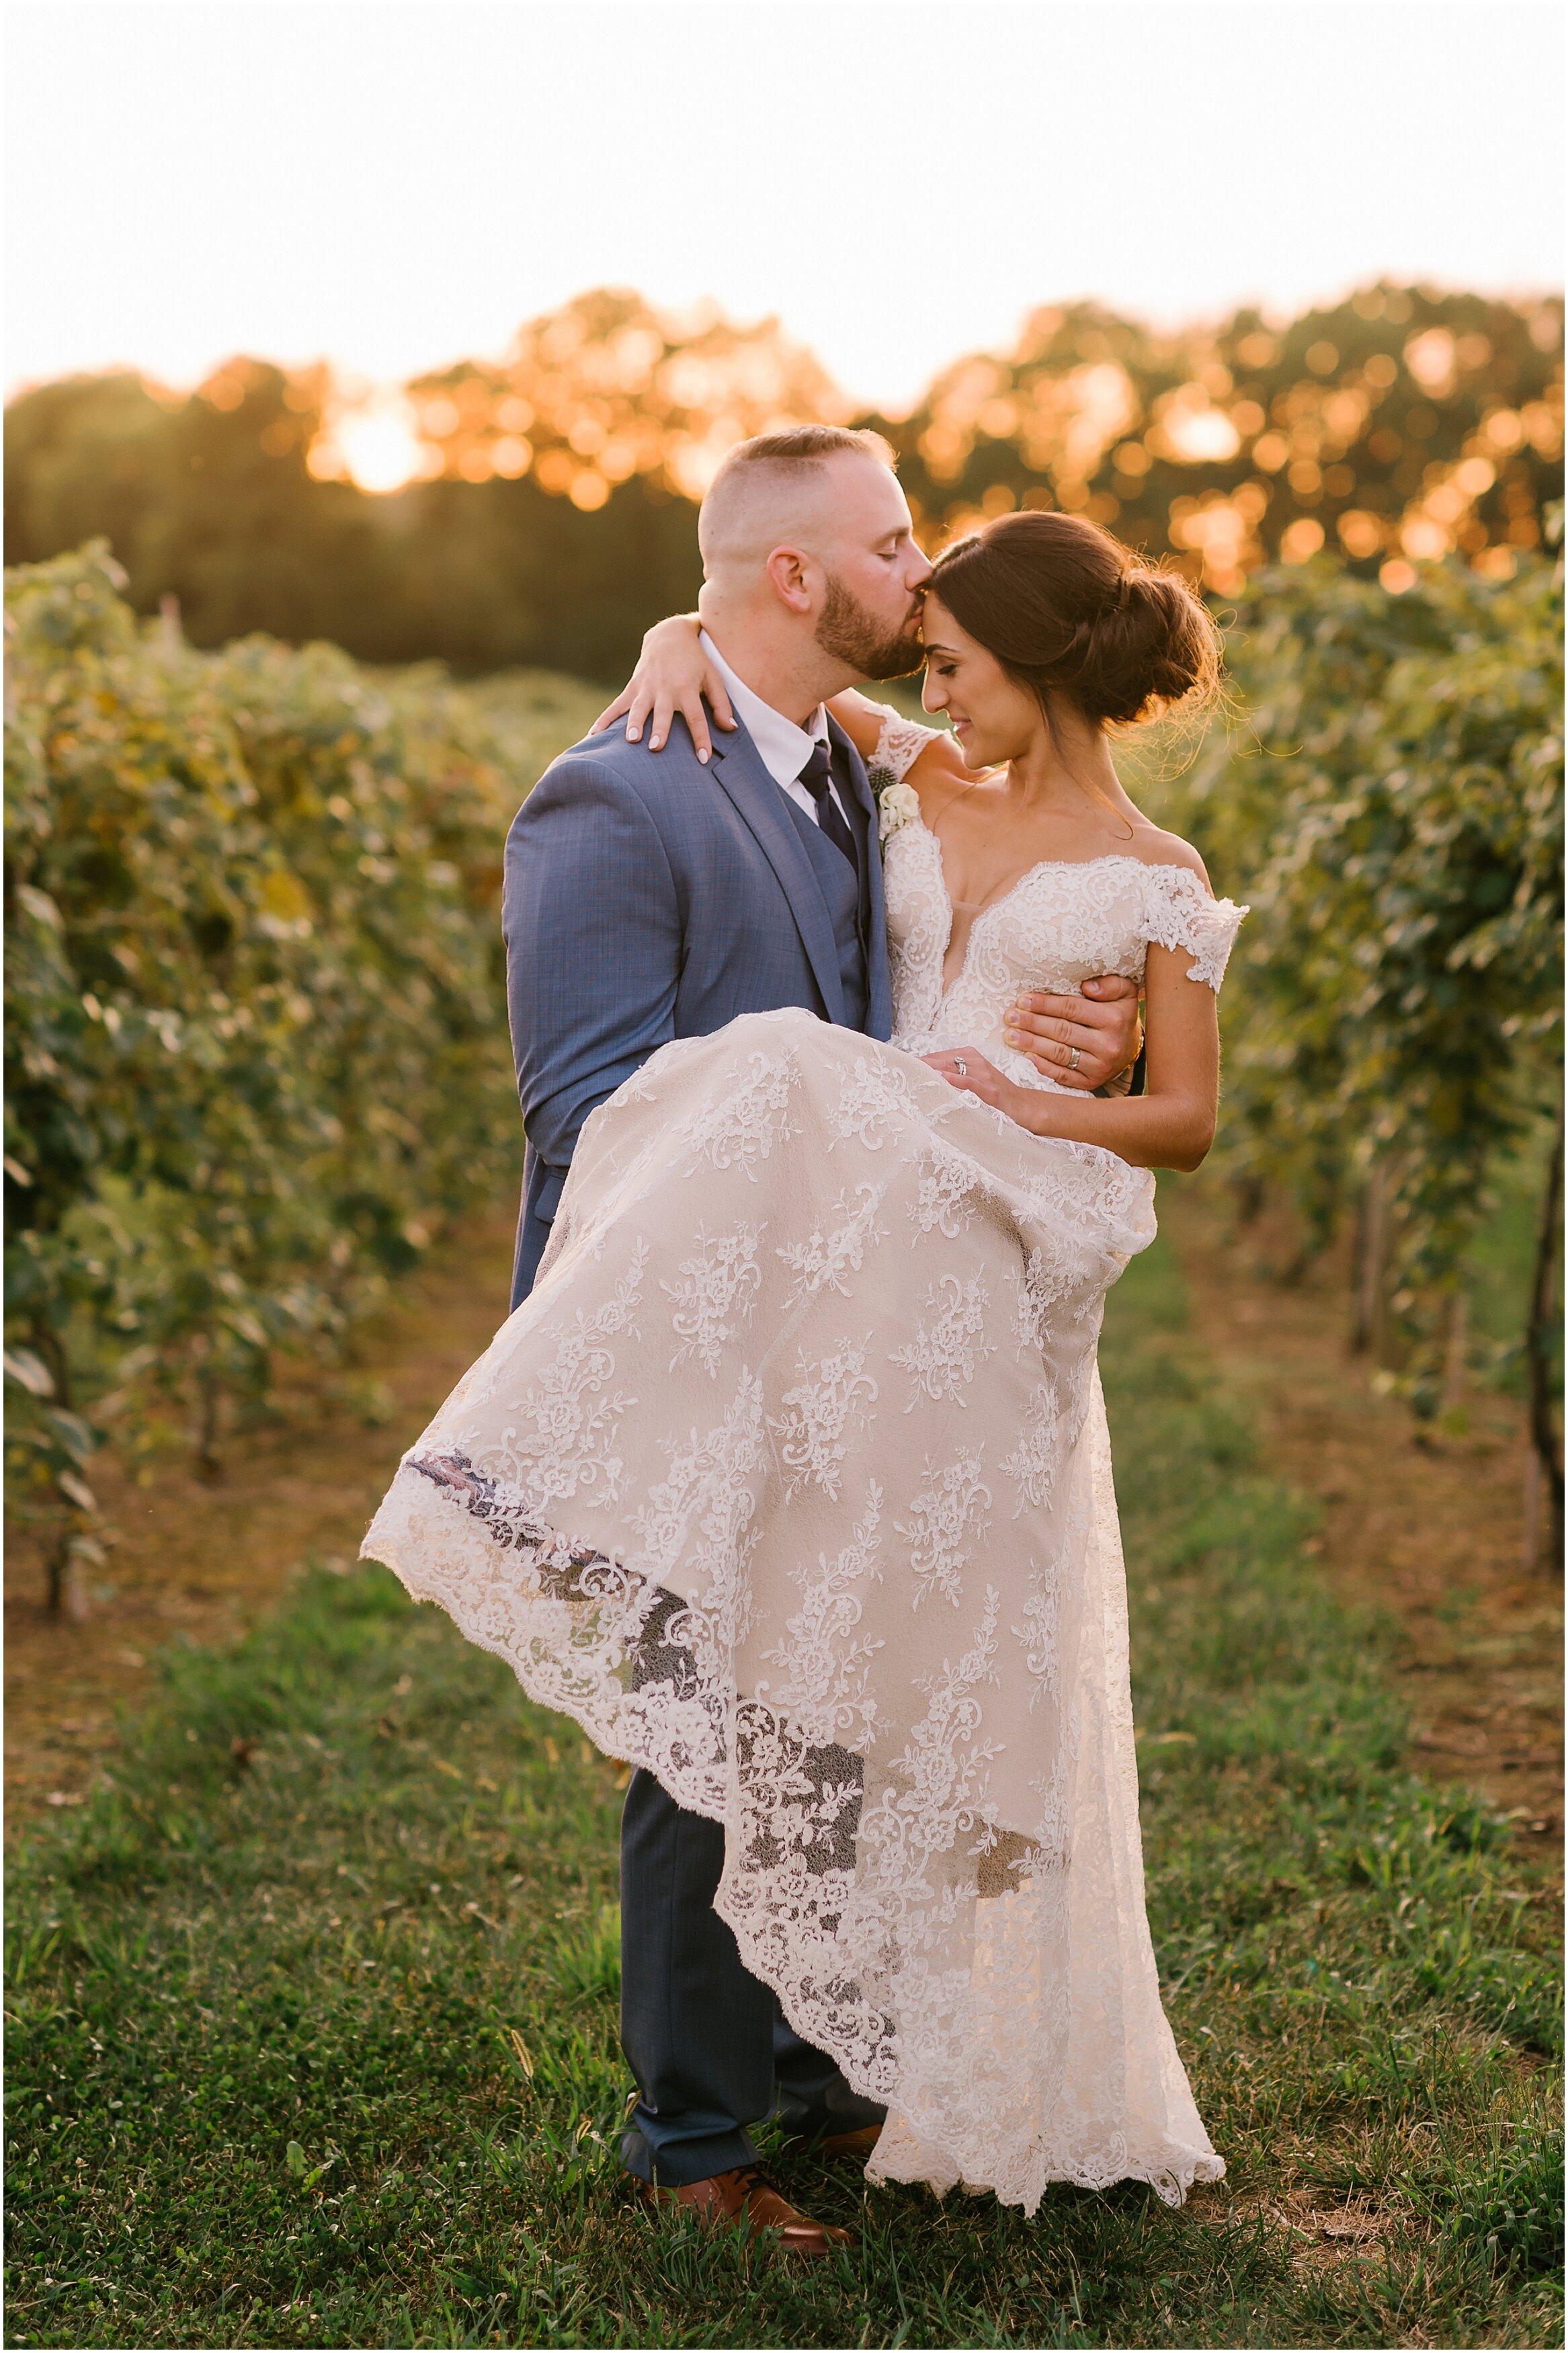 Rebecca Shehorn Photography Indianapolis Wedding Photographer Sycamore at Mallow Run_0785.jpg